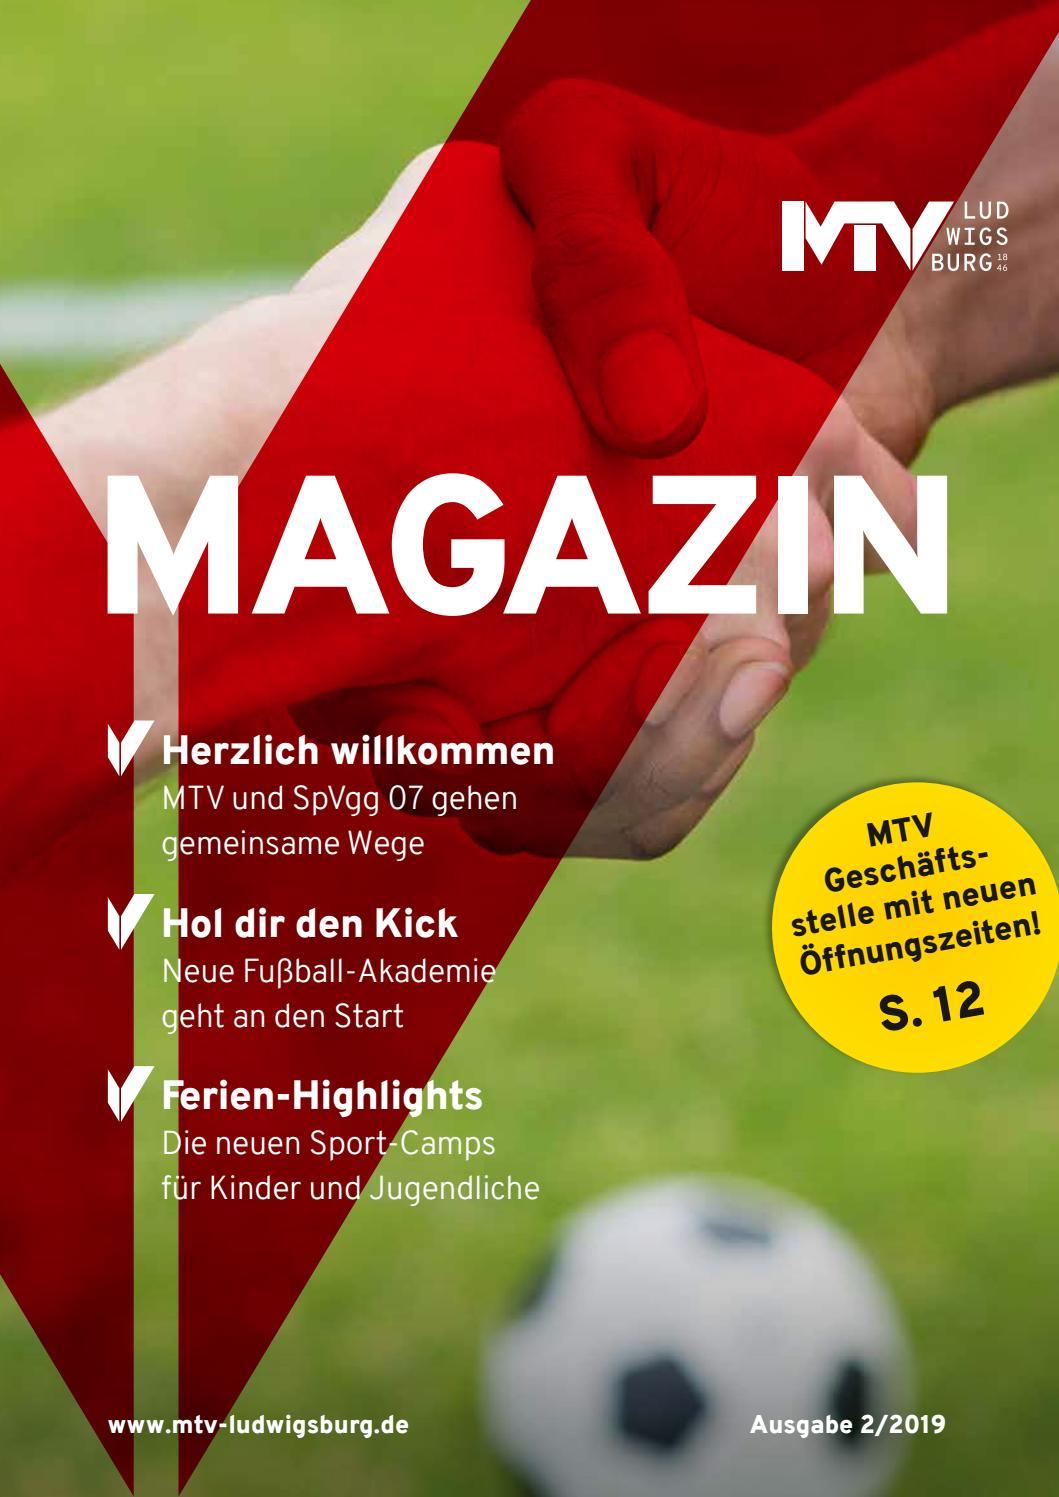 MTV Magazin 2019 2 by MTV Ludwigsburg issuu